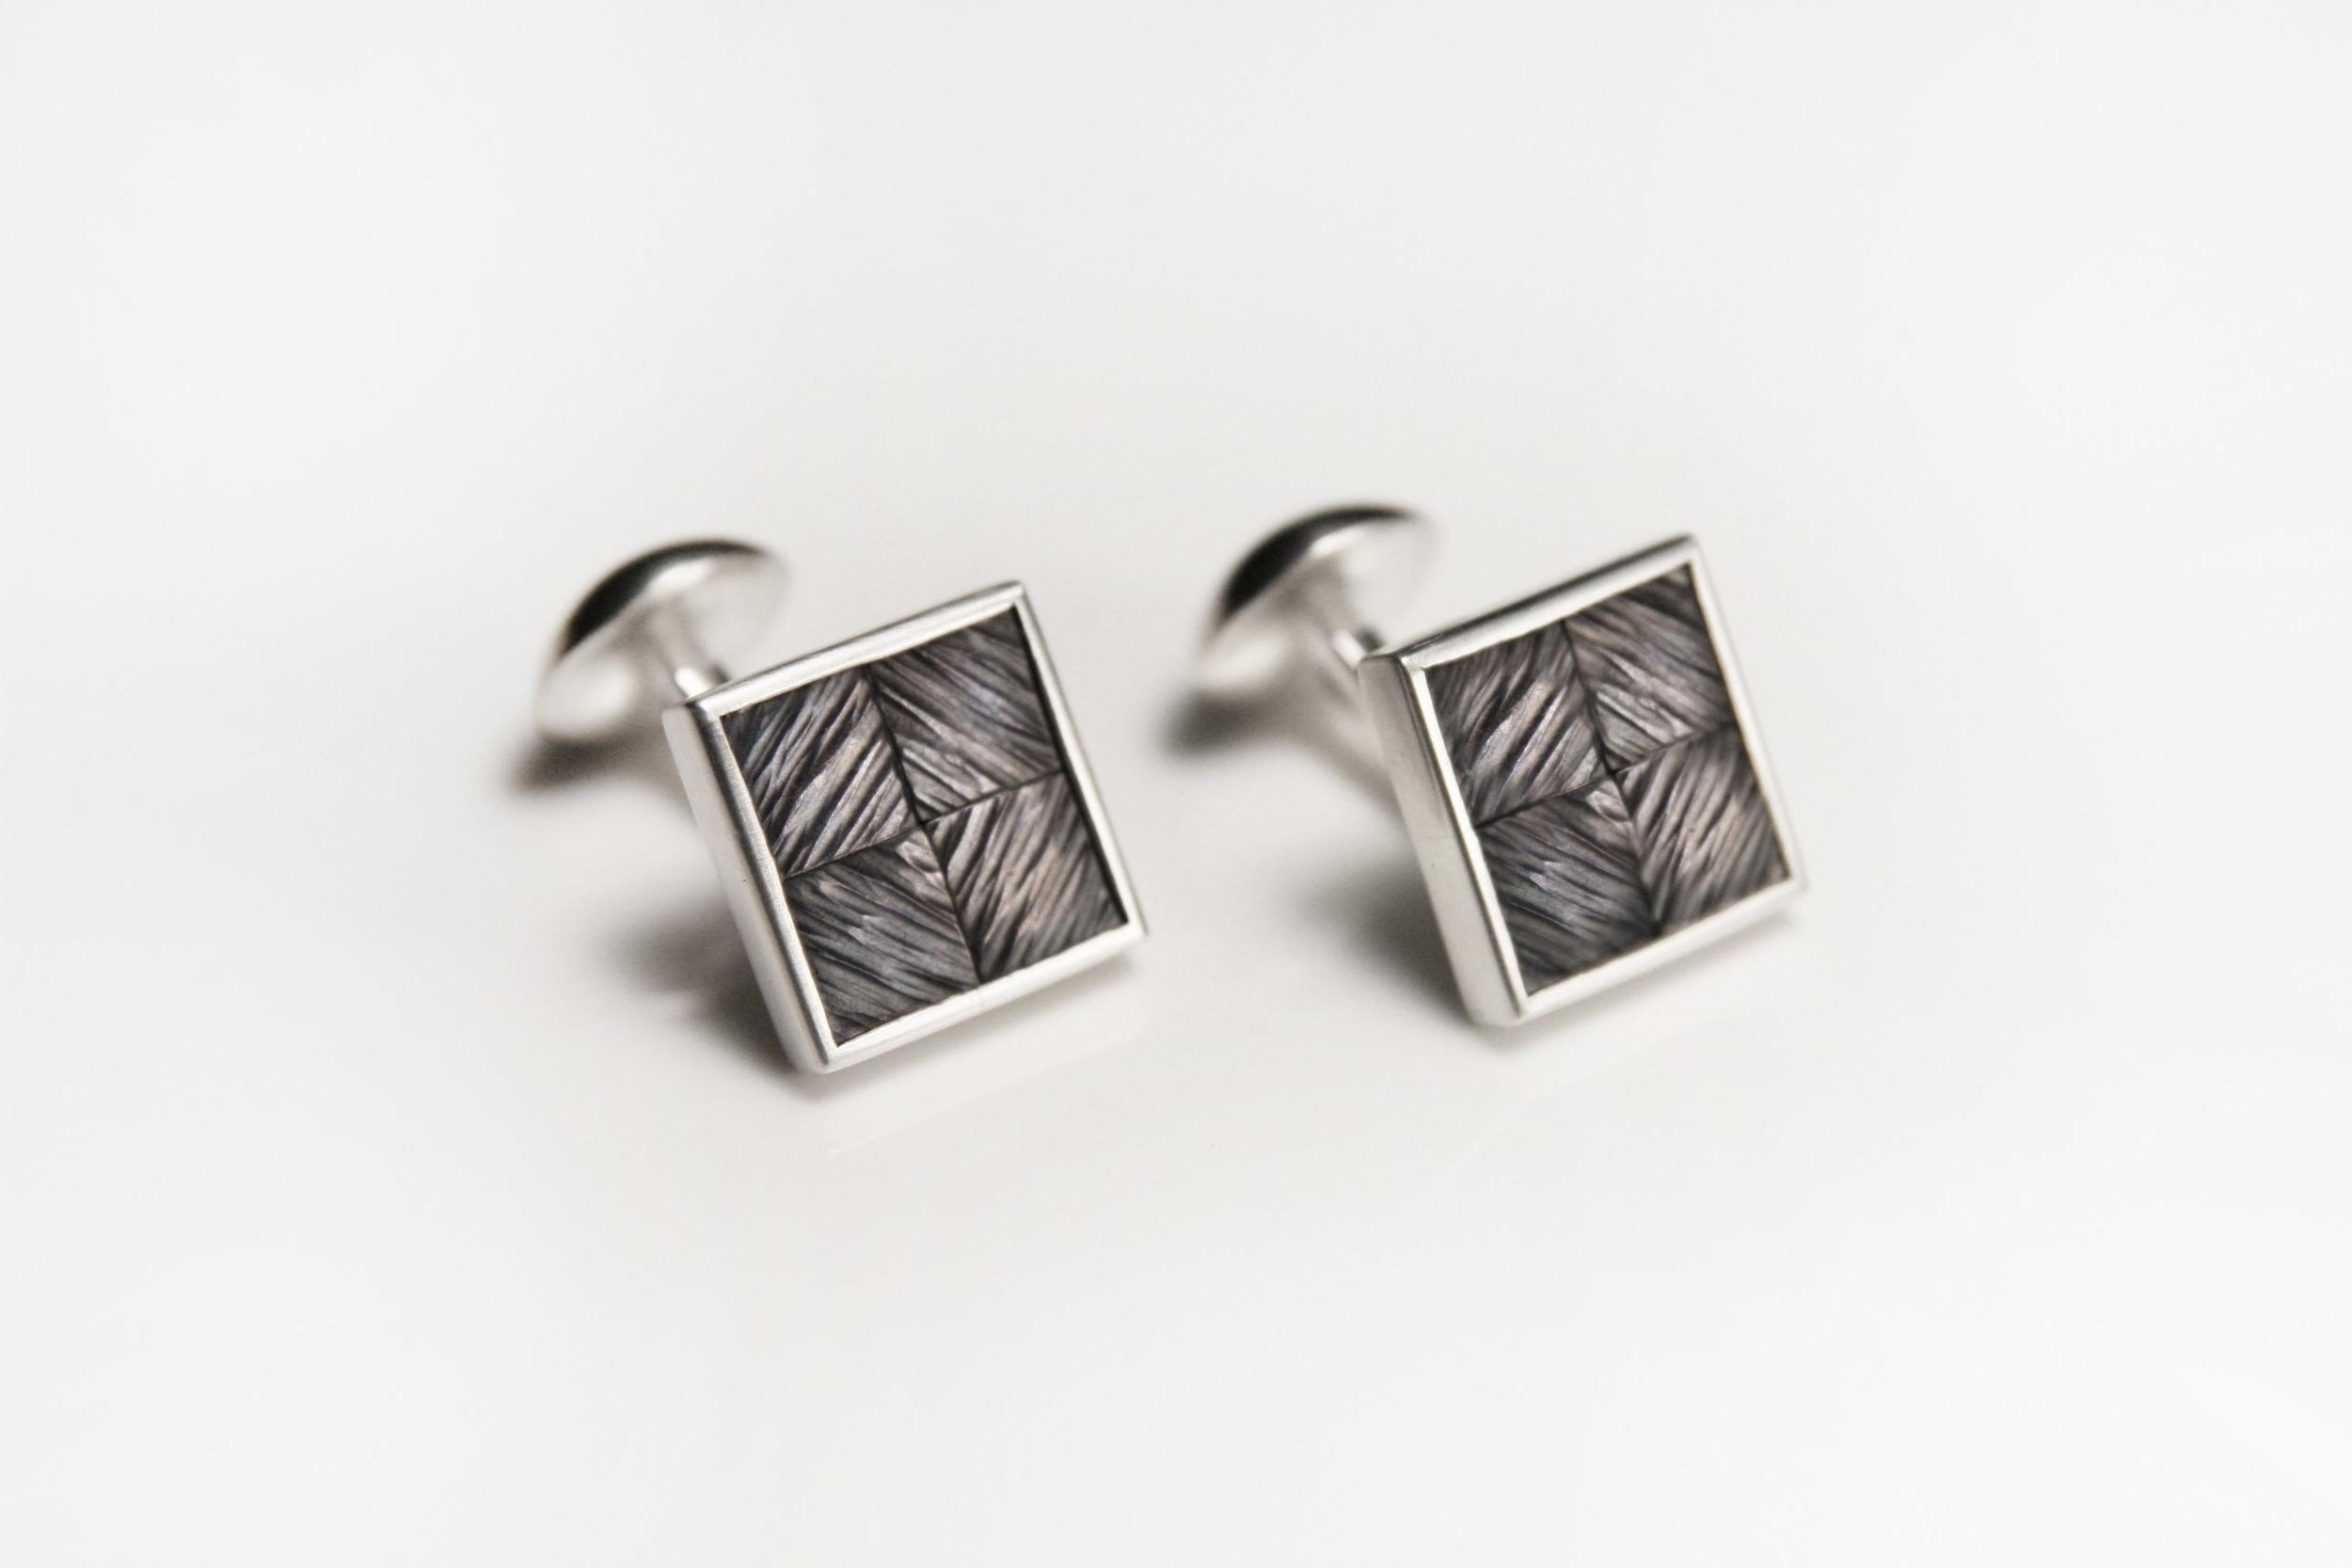 Diamond_herringbone_cufflinks_1_light.jpg